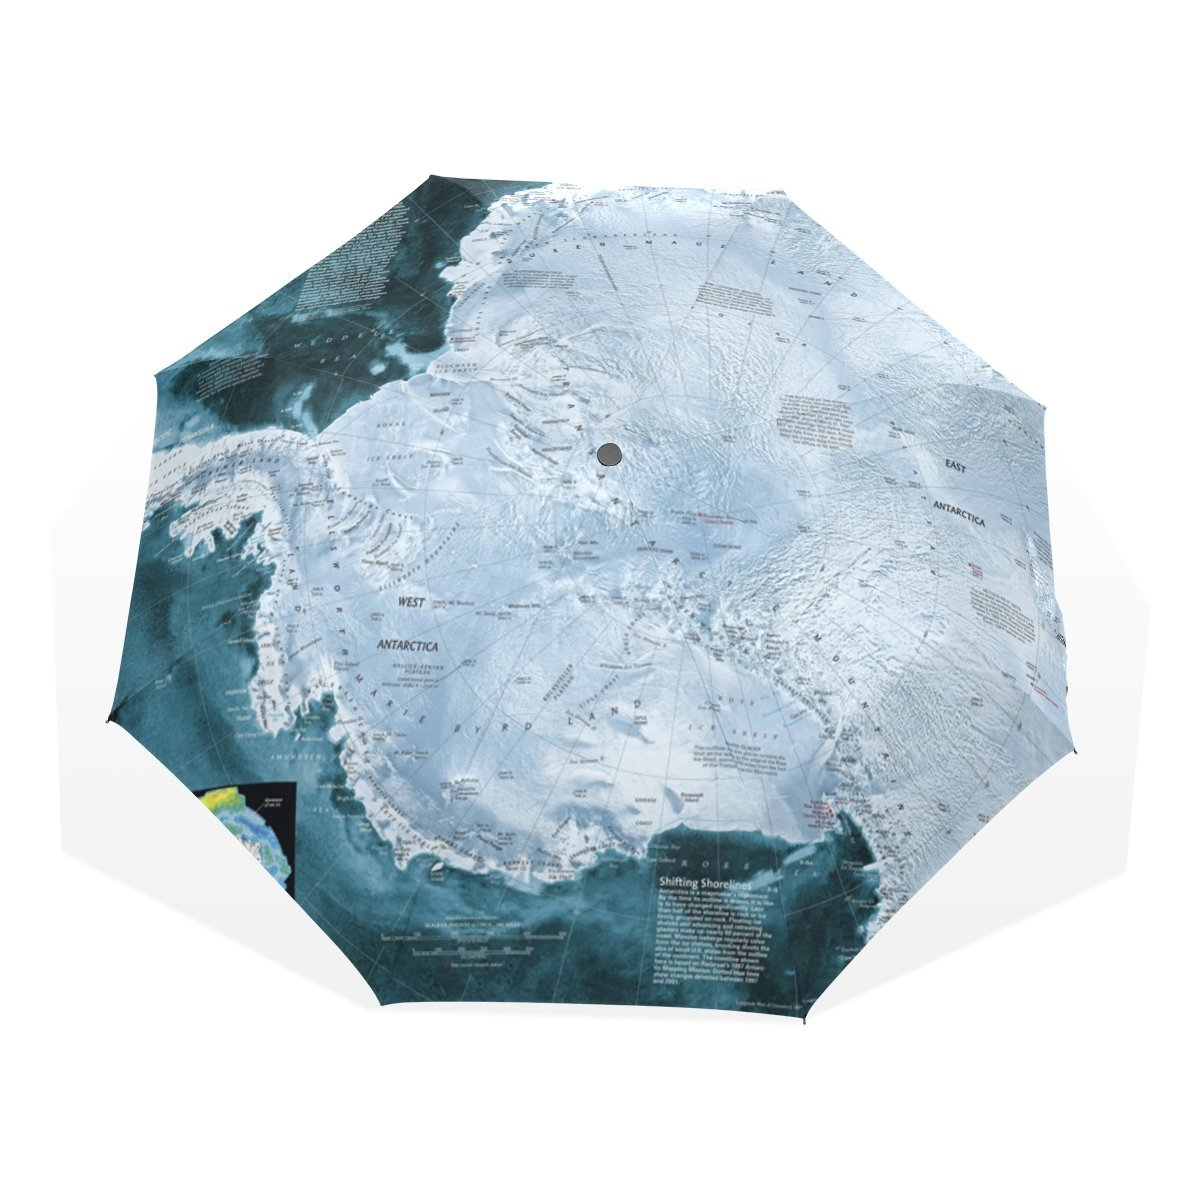 HMWR World Map Umbrella Windproof Compact Light Blue Airflow Trajectory Fashion Weather Enthusiast Like World Map Fashion World Map Folding Travel Rain Umbrella